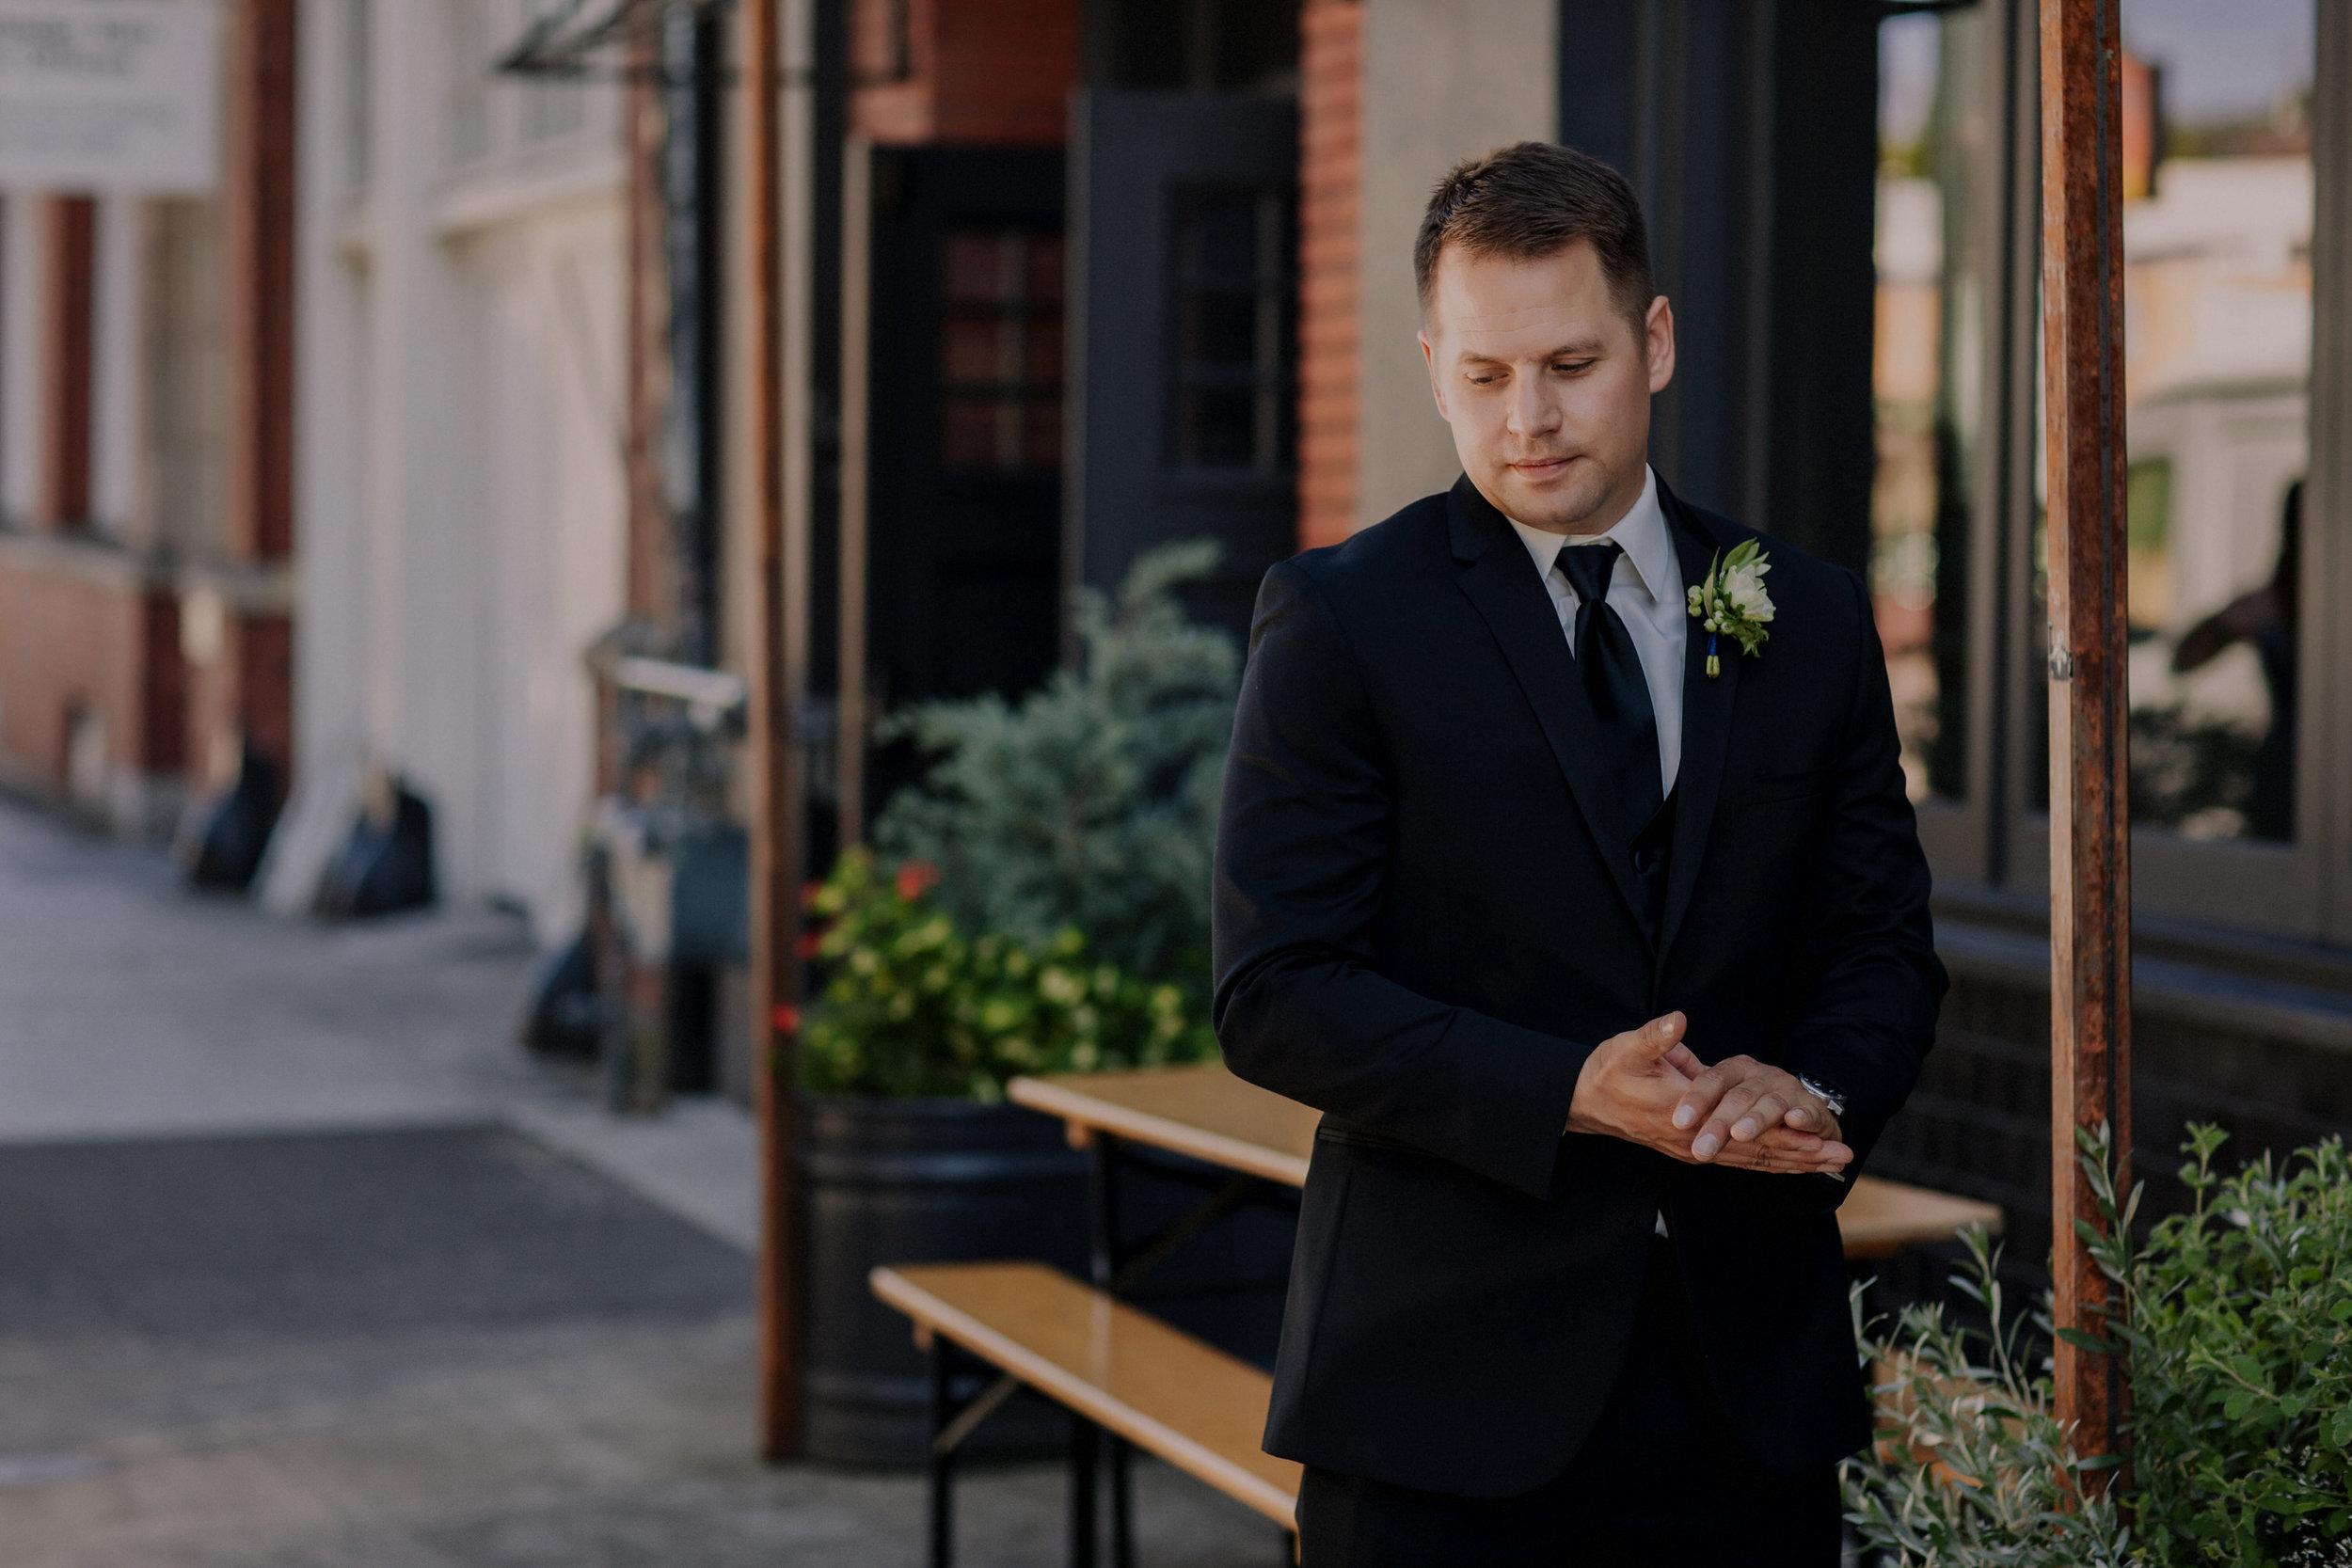 Bridalbliss.com | Portland Wedding | Oregon Event Planning and Design |  Robert J. Hill Photography